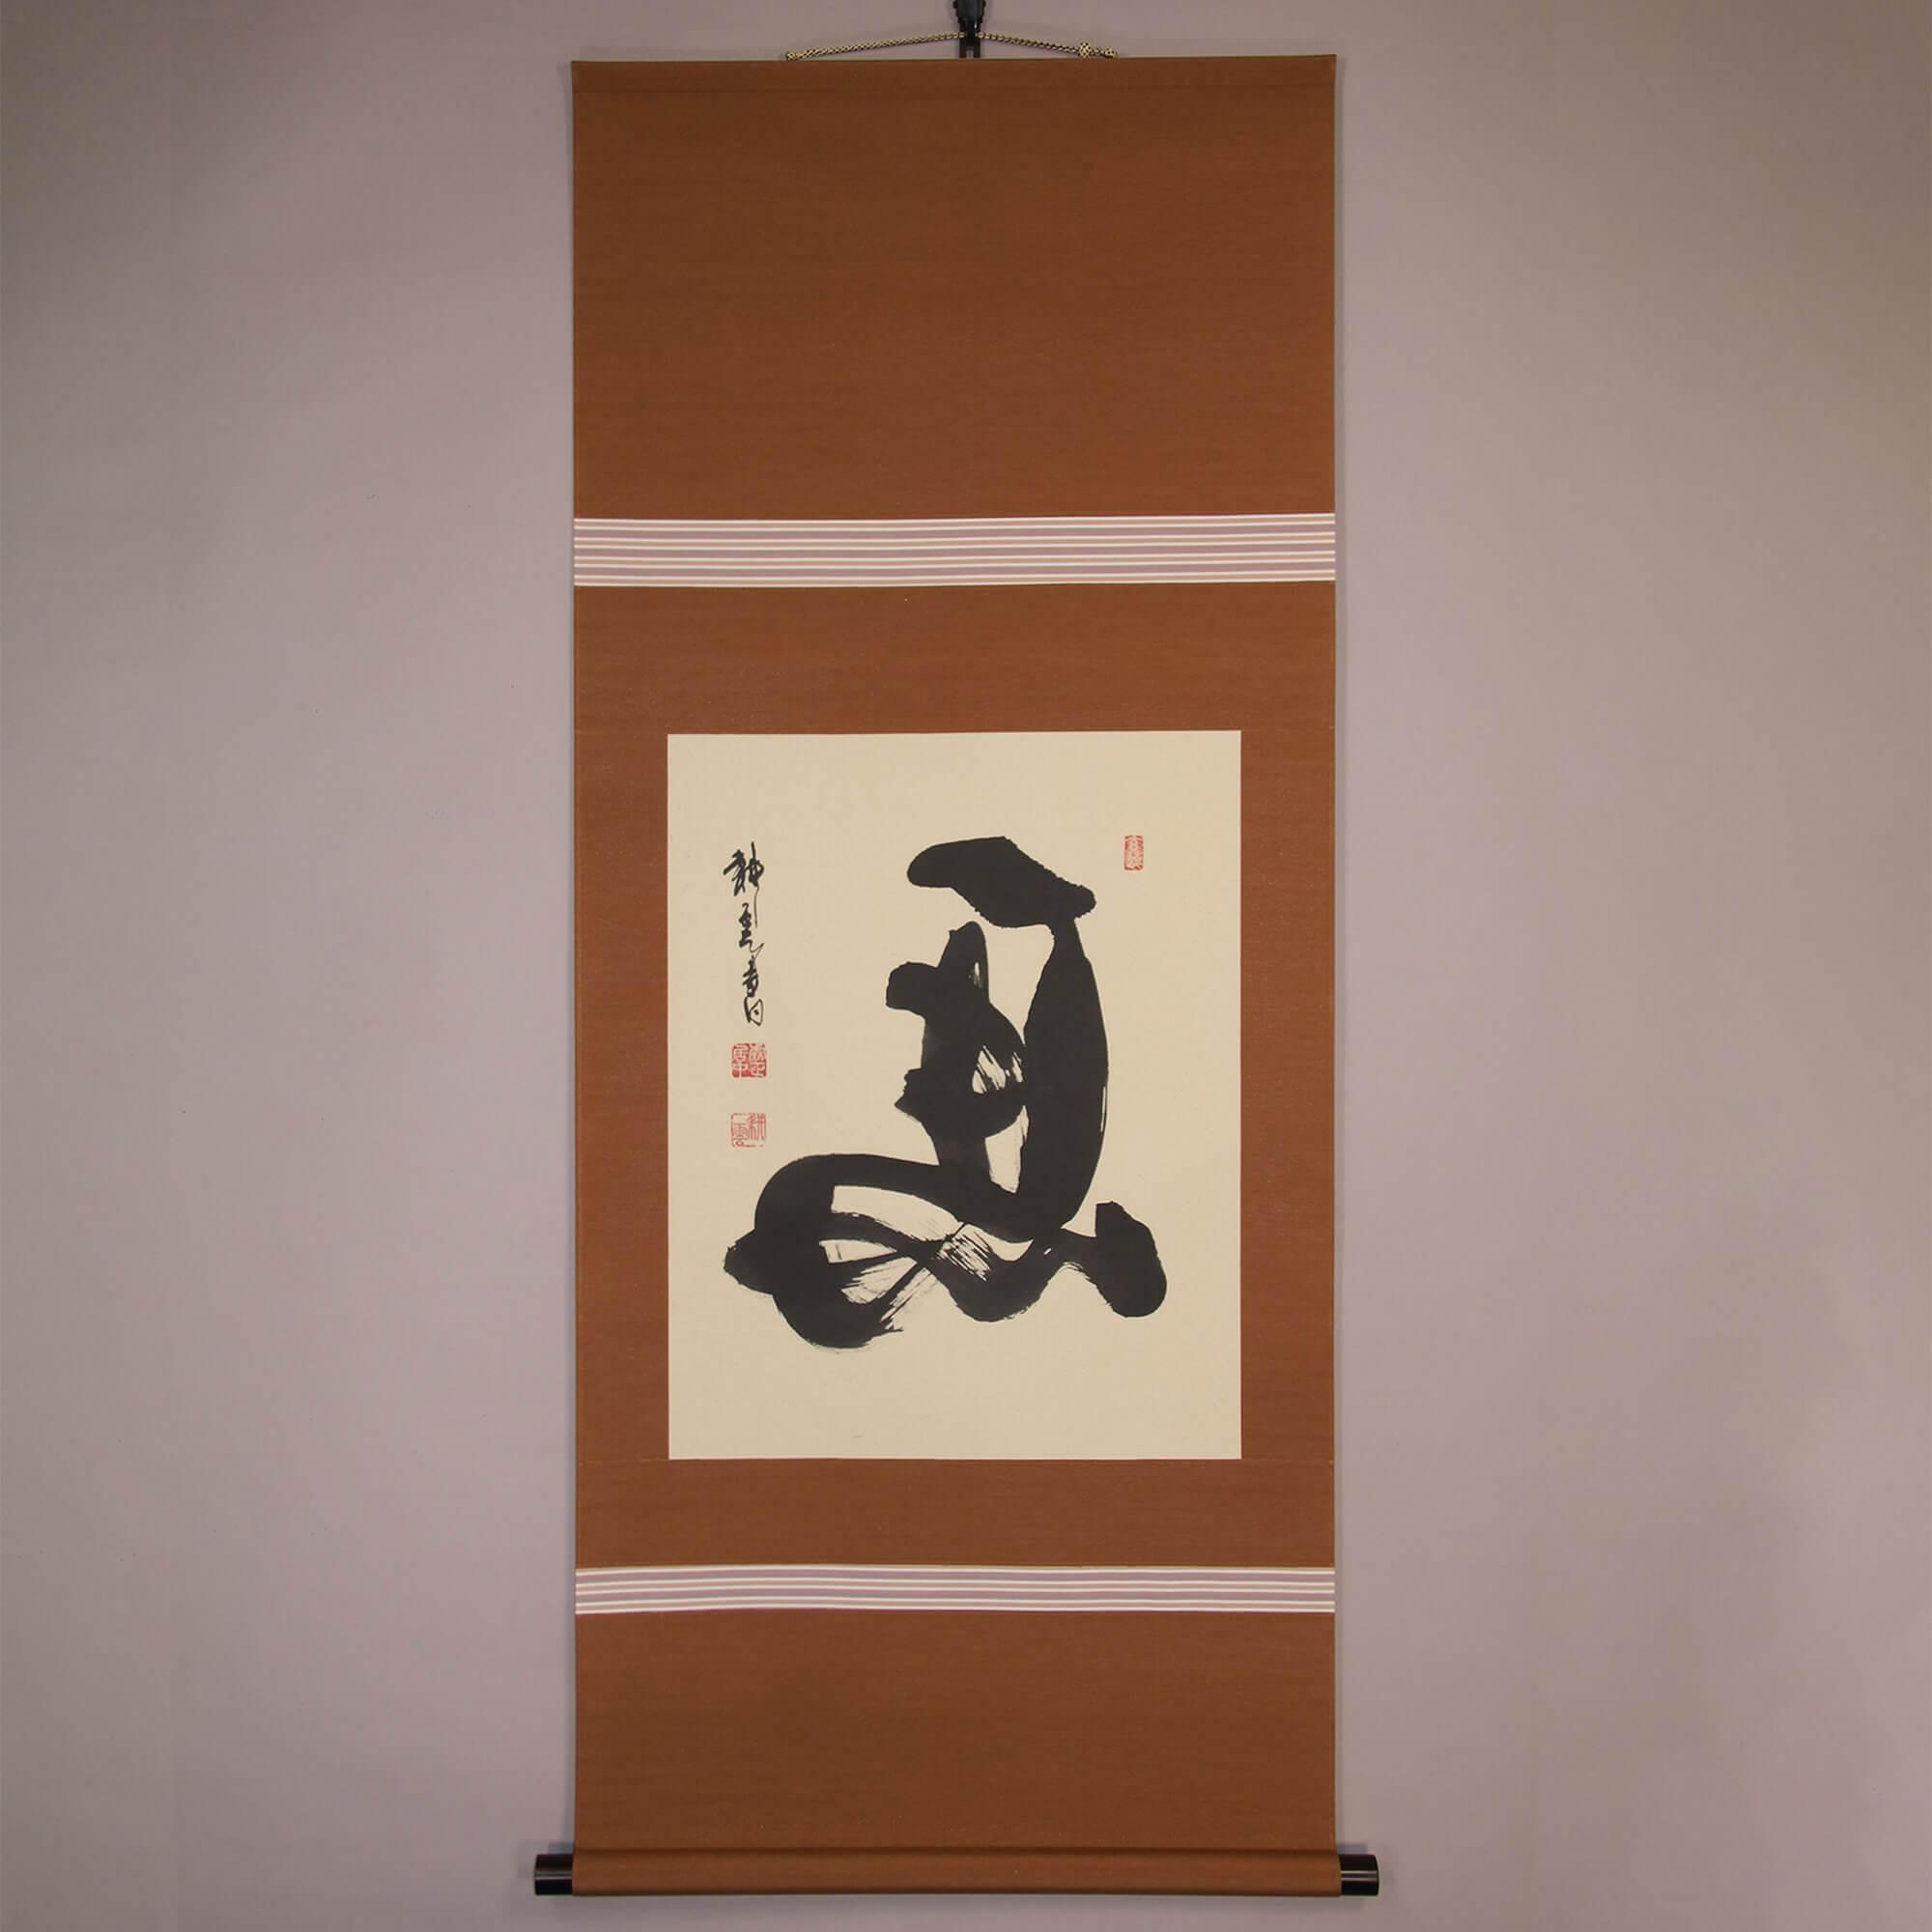 Reversal of Horse / Nakasaka Kōun